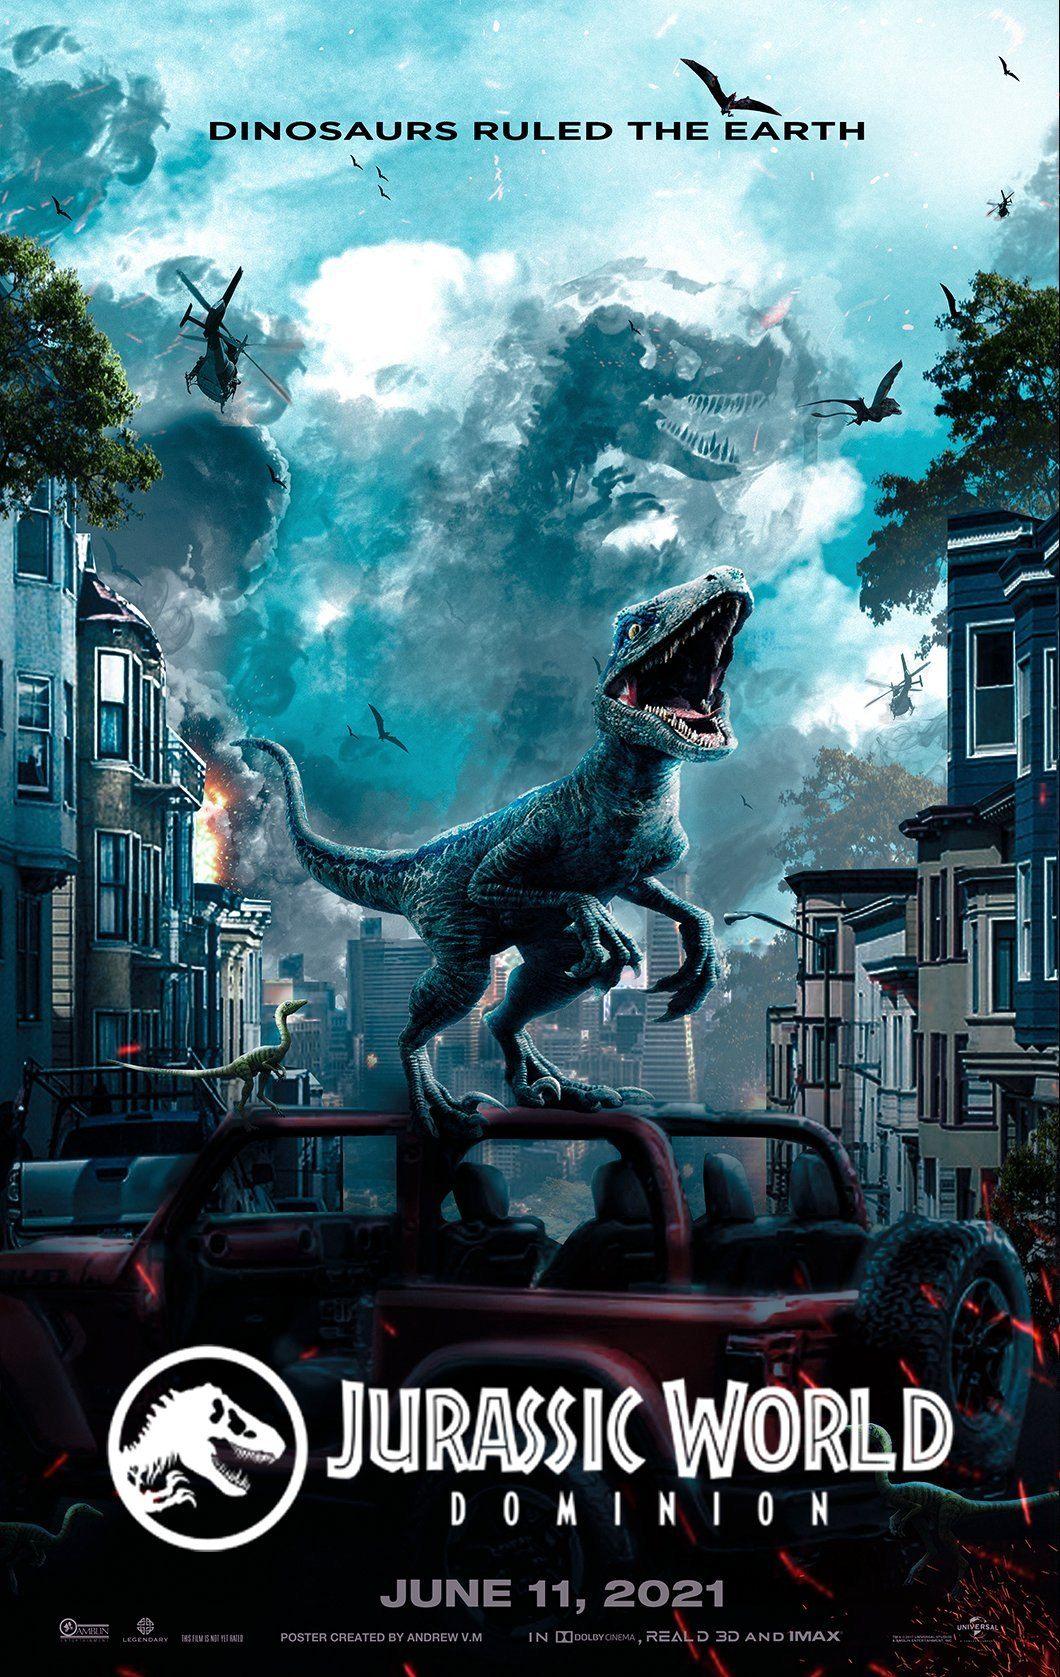 Fan Art De Jurassic World Dominion Fotos De Dinosaurios Dinosaurios Jurassic World Ilustracion De Dinosaurios